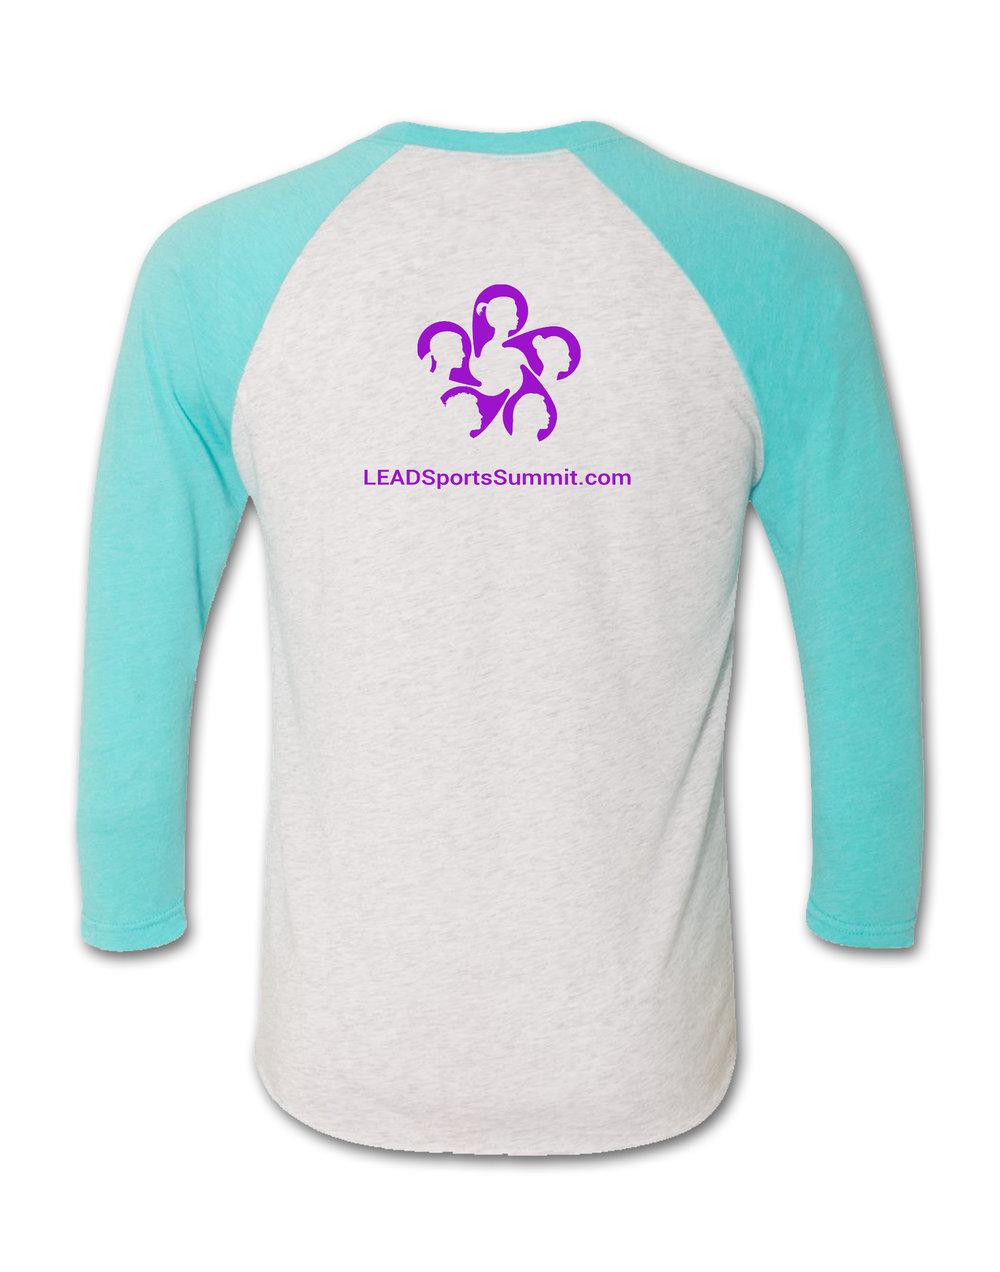 Lead Baseball T Shirt Teal Purple Lead Sports Summit